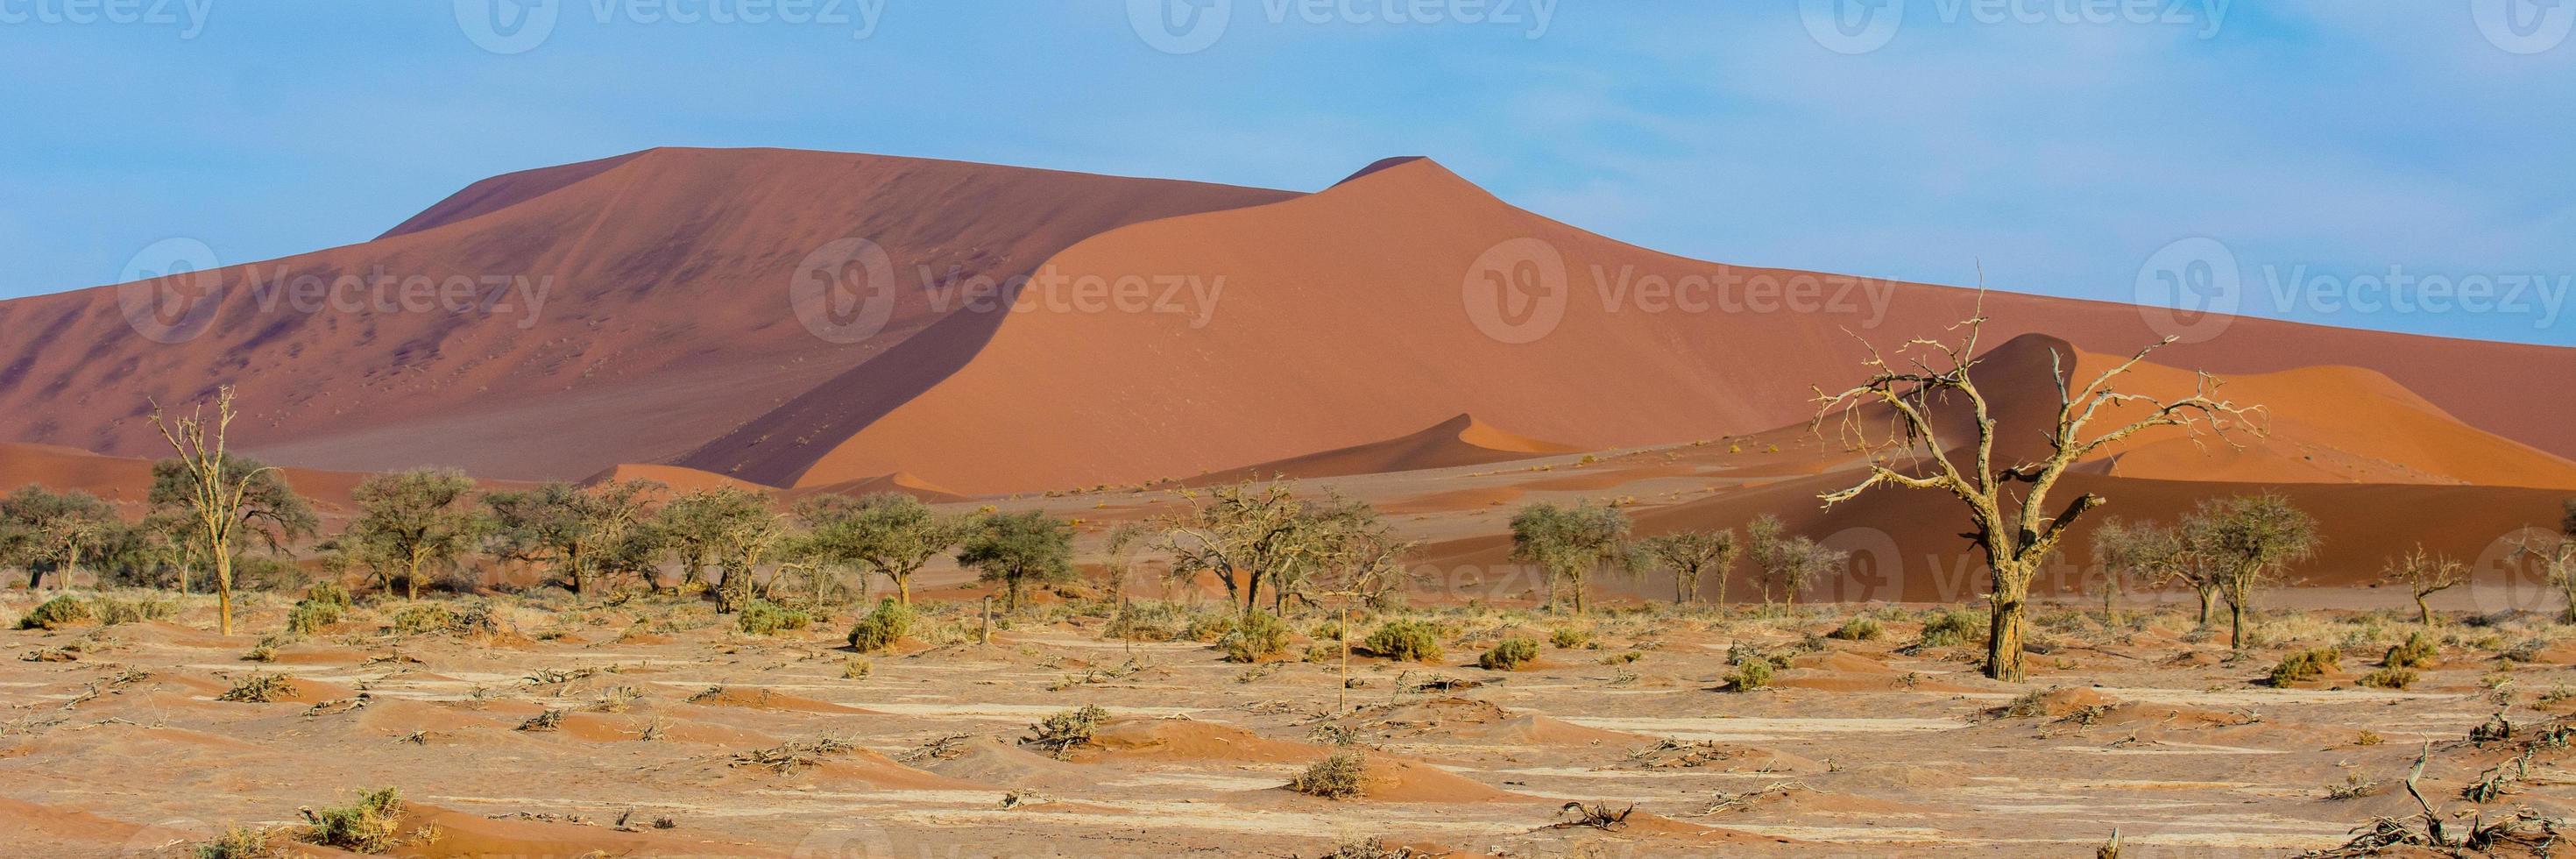 rode woestijnduinen foto